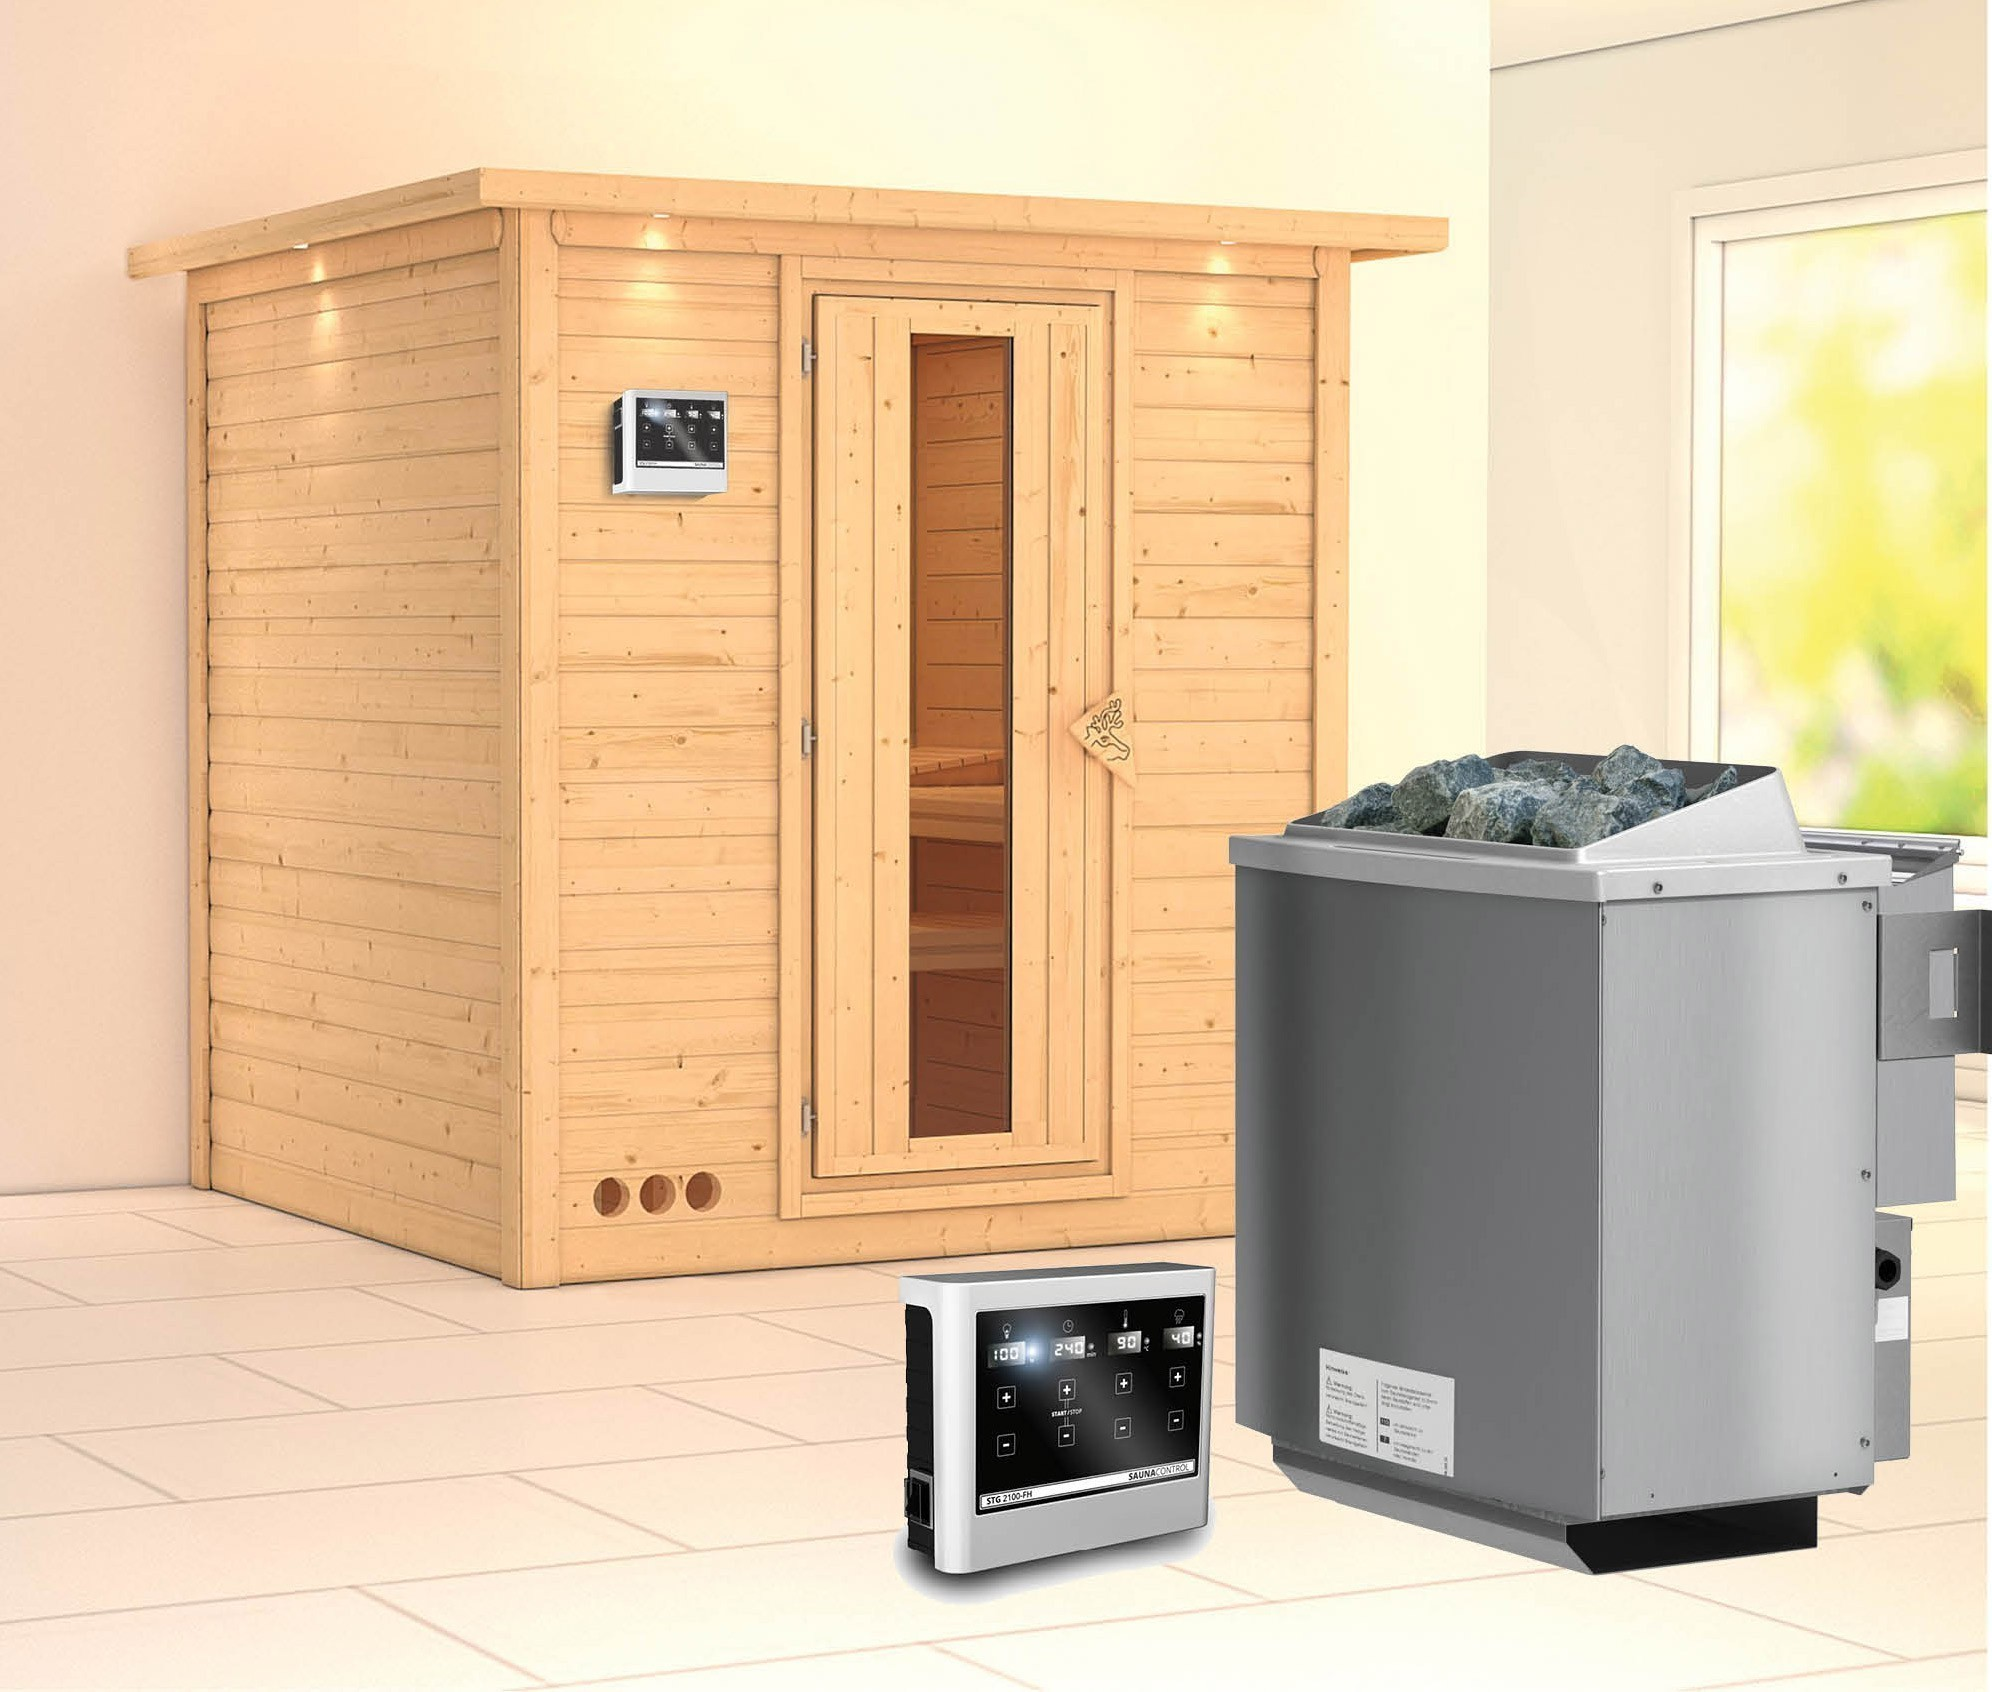 Karibu Sauna Mojave 40mm Dachkranz + Bio Ofen 9kW Holztür Bild 1